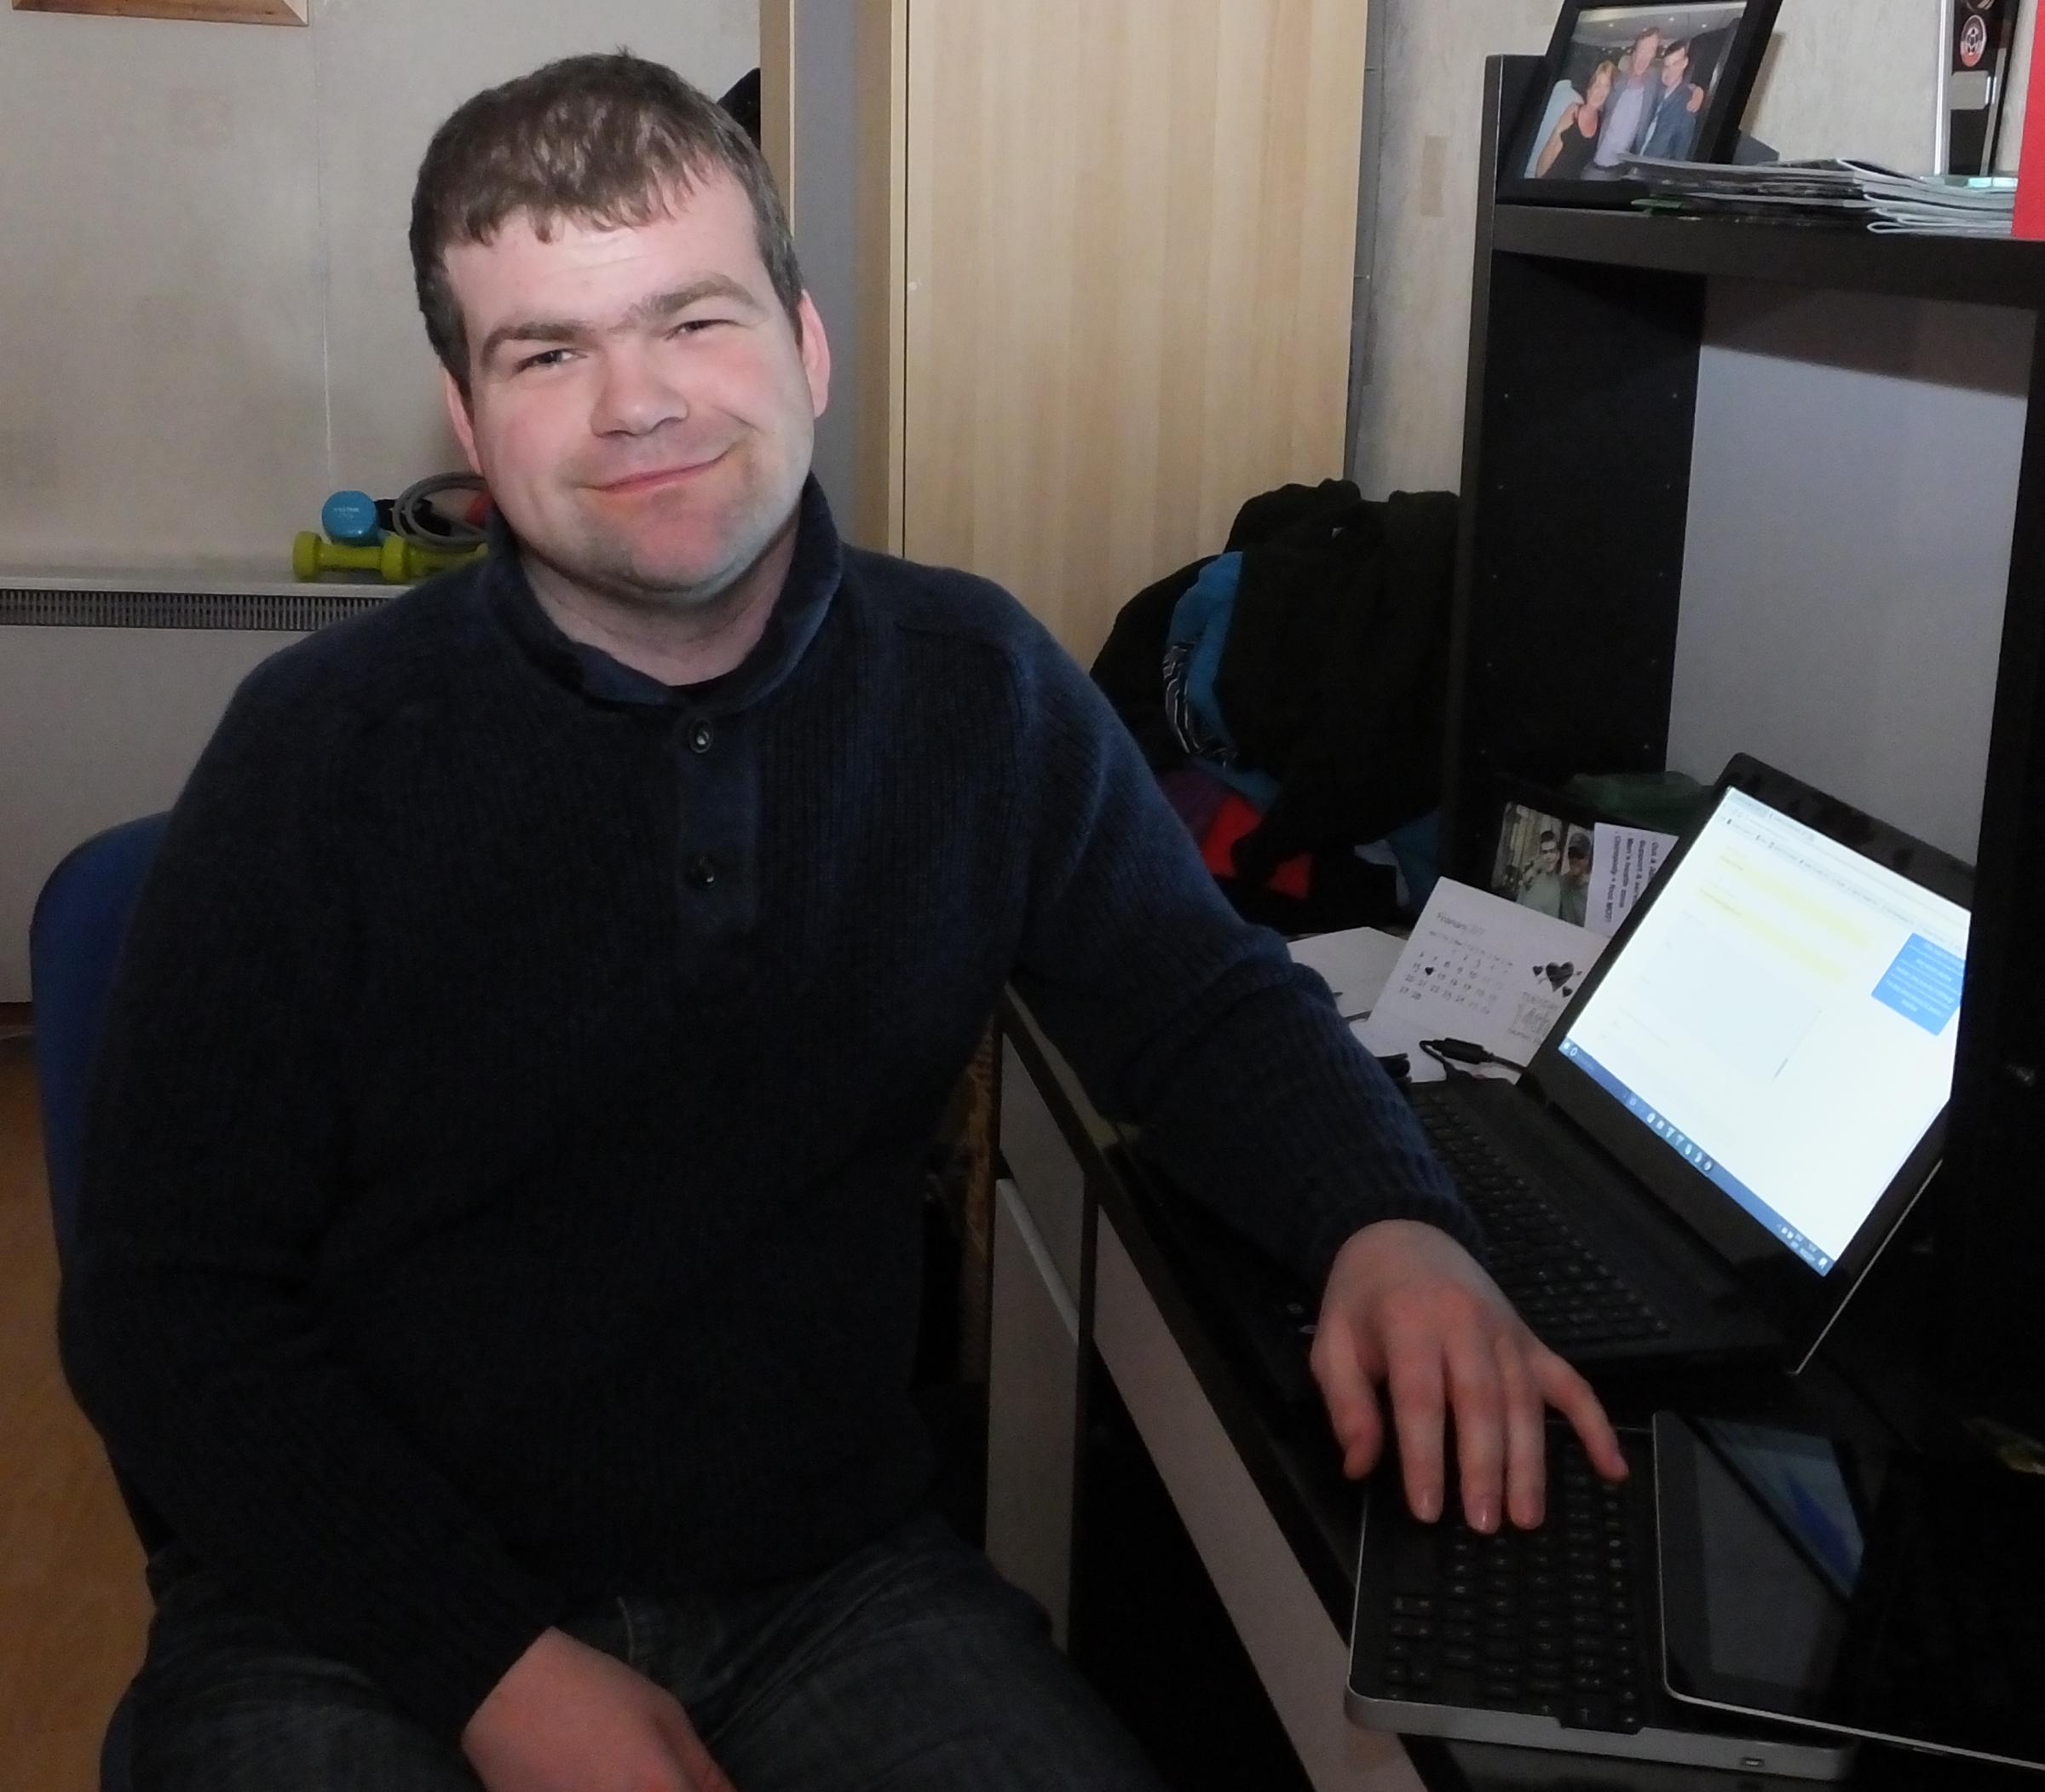 ERDA chairman Michael McEwan